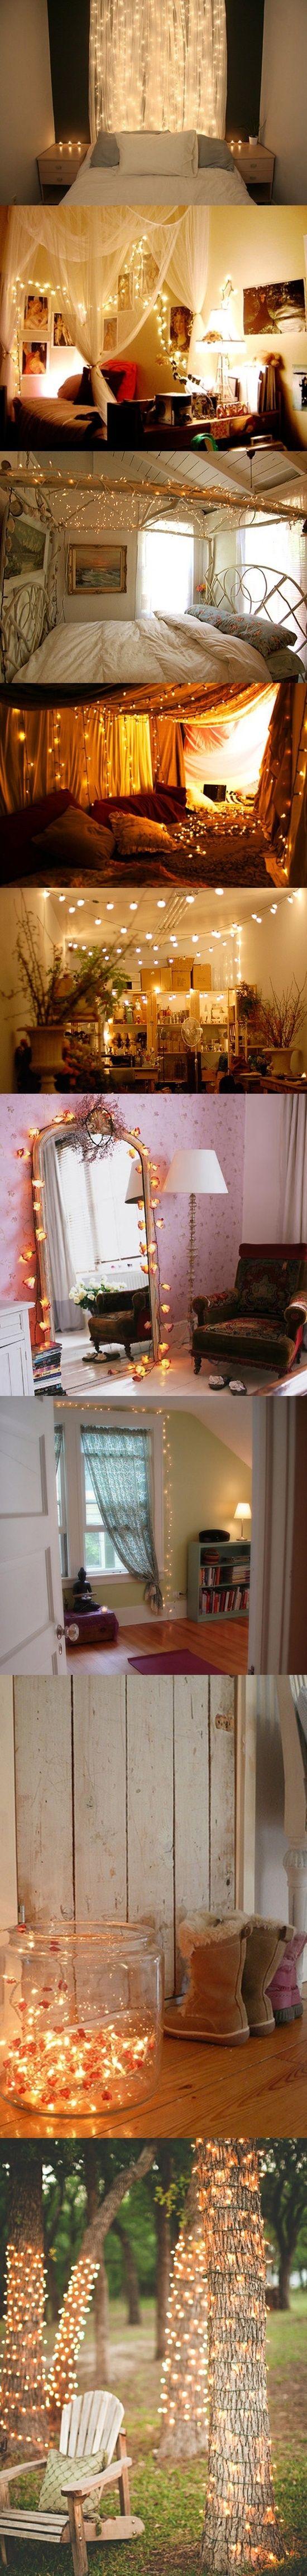 String Lights Pinterest : love me some lights - Click image to find more DIY & Crafts Pinterest pins cool ideas ...